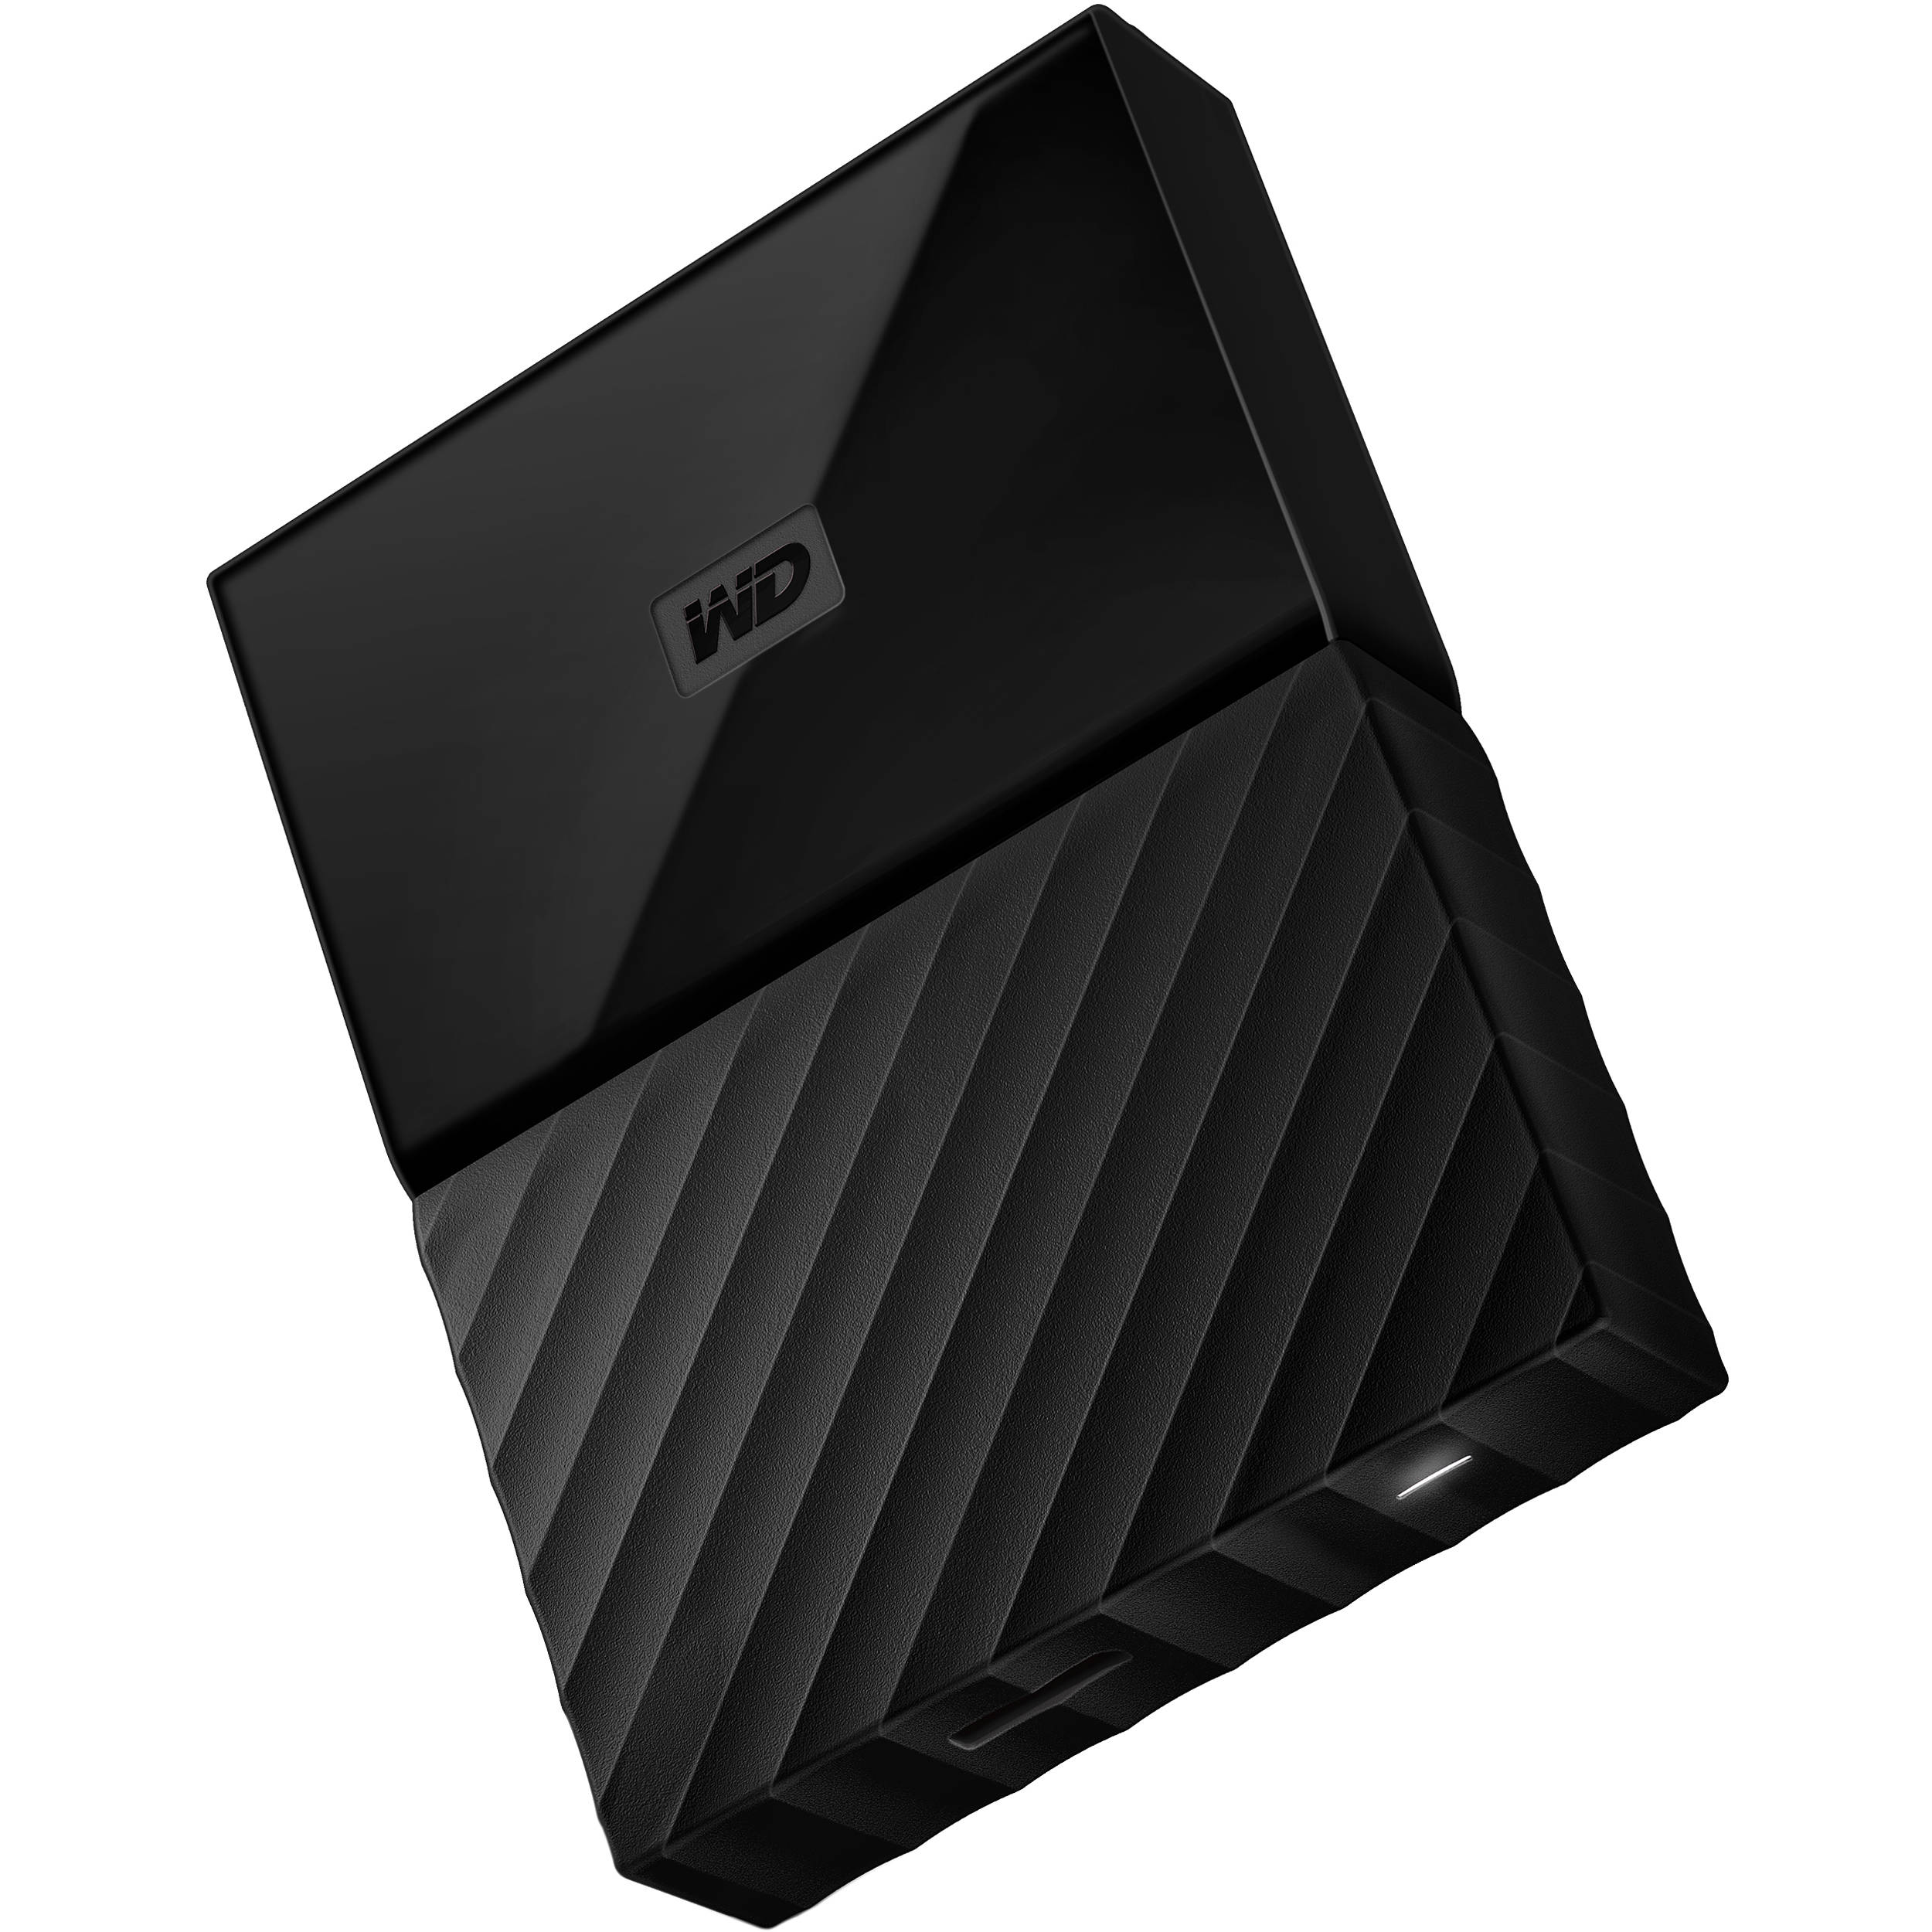 WD 4TB My Passport USB 3 0 Secure Portable Hard Drive (Black)